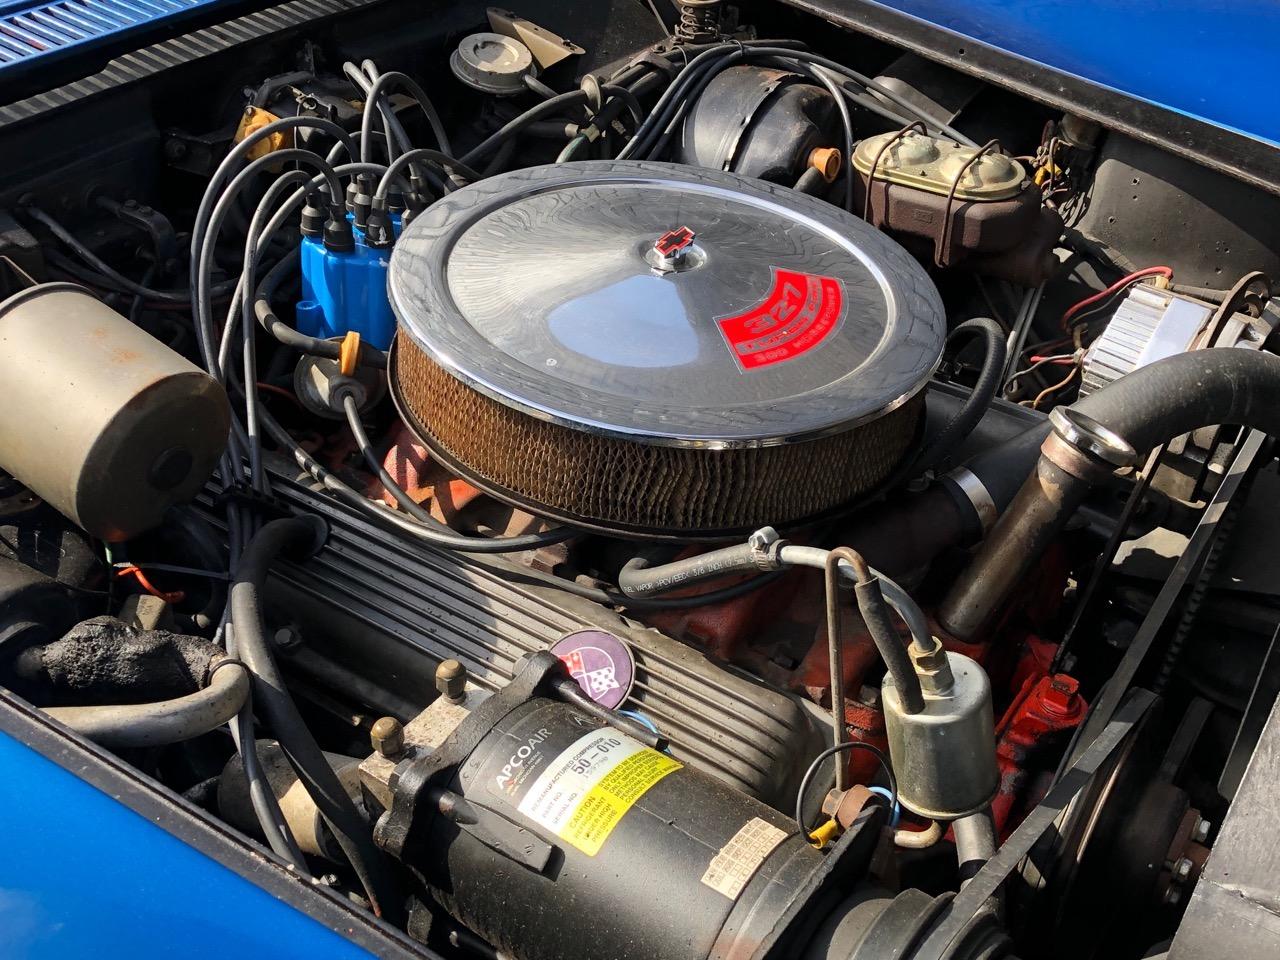 Used-1969-Chevrolet-Corvette-C3-Stingray-Matching-Numbers